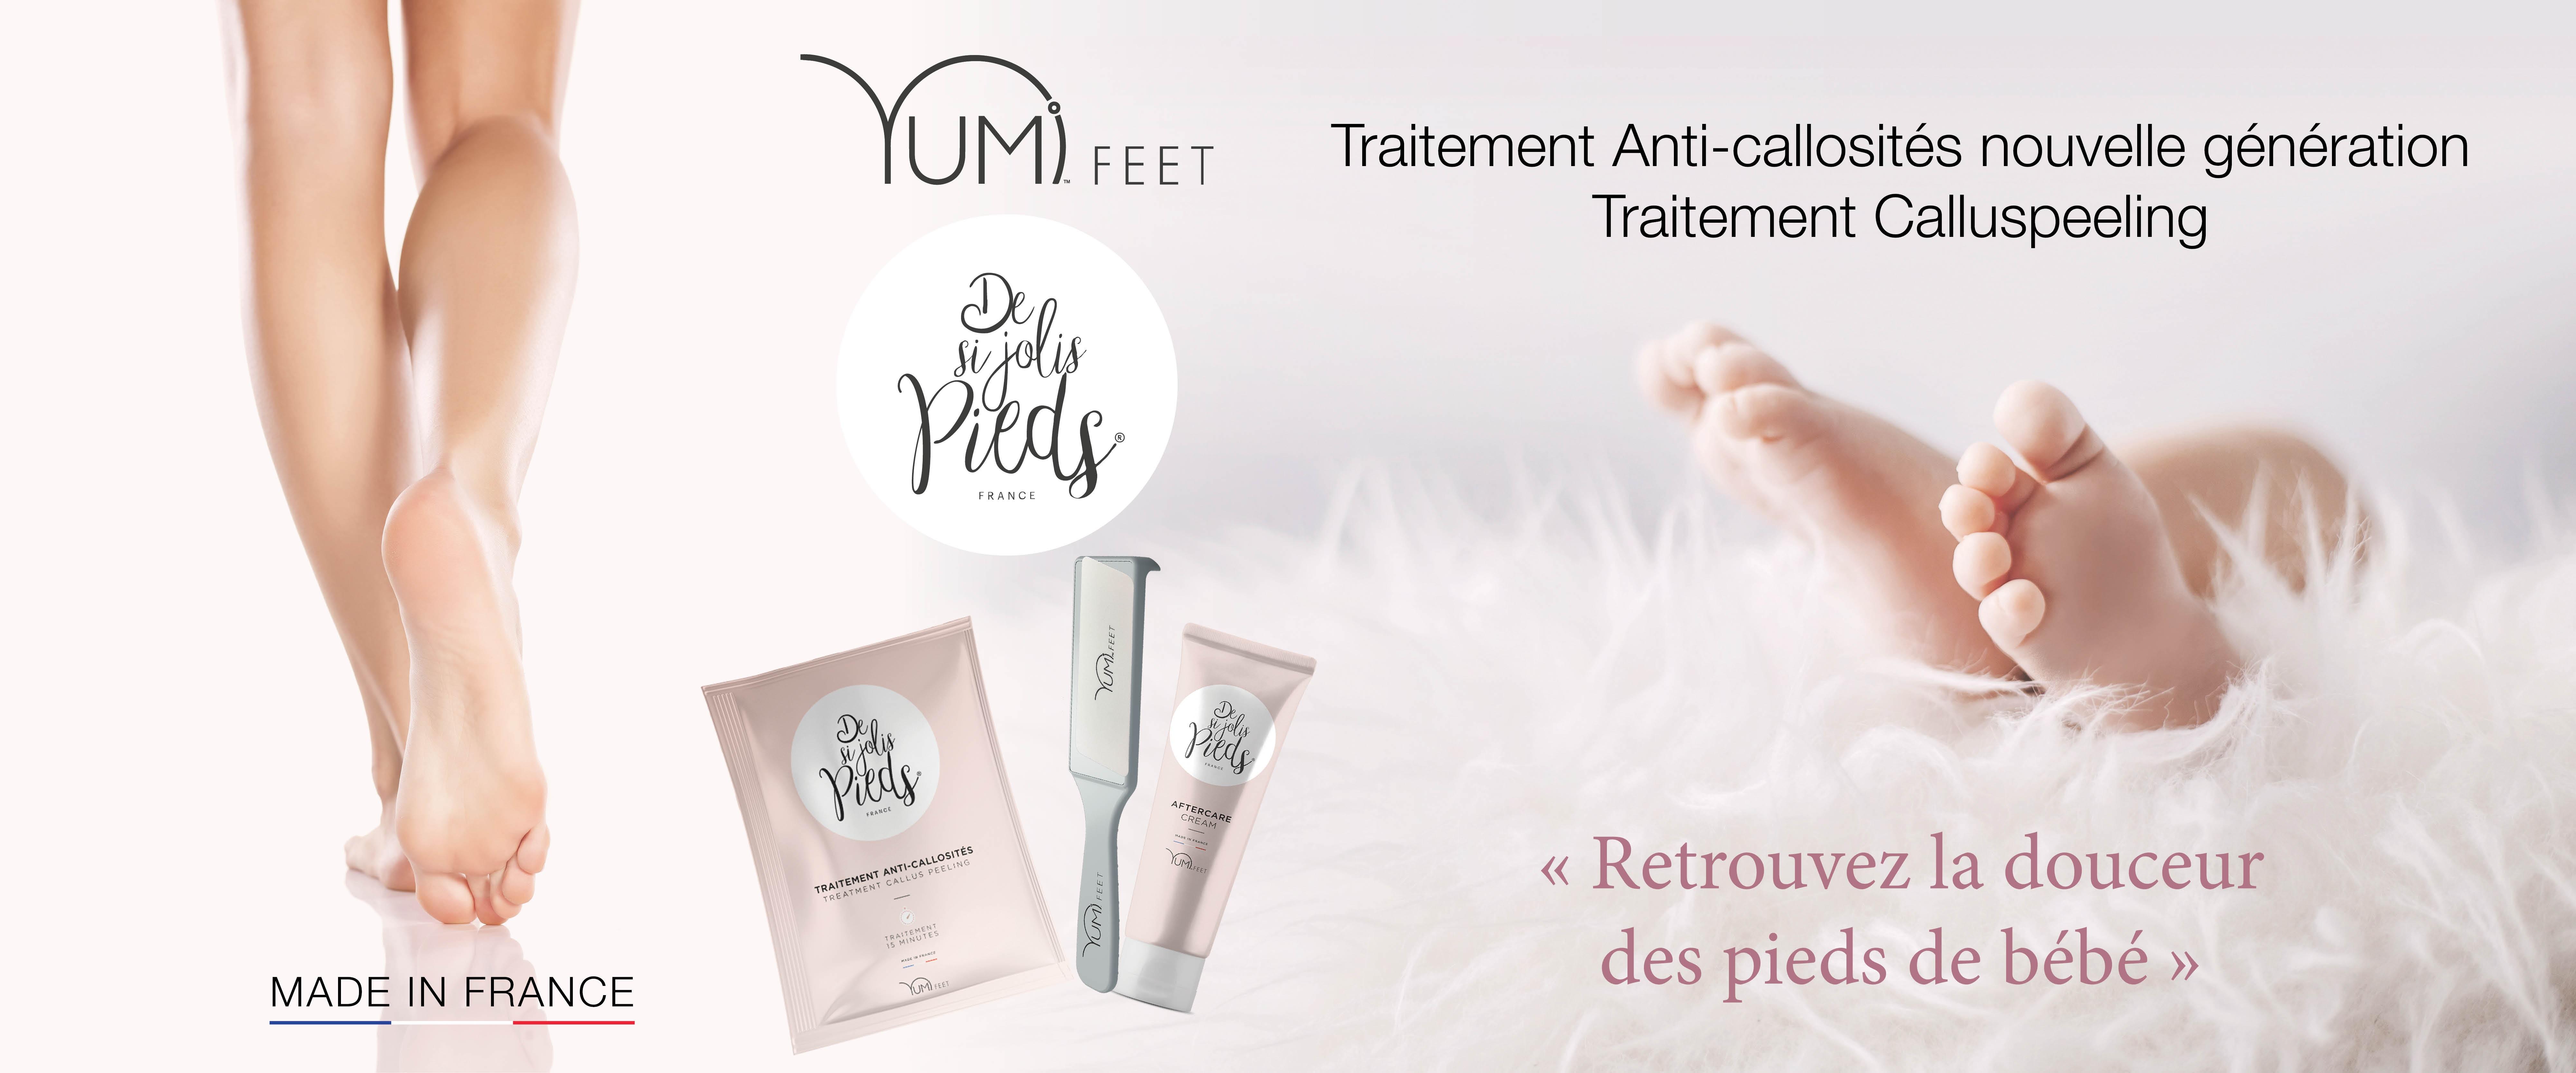 Yumi Feet soin Calluspeeling